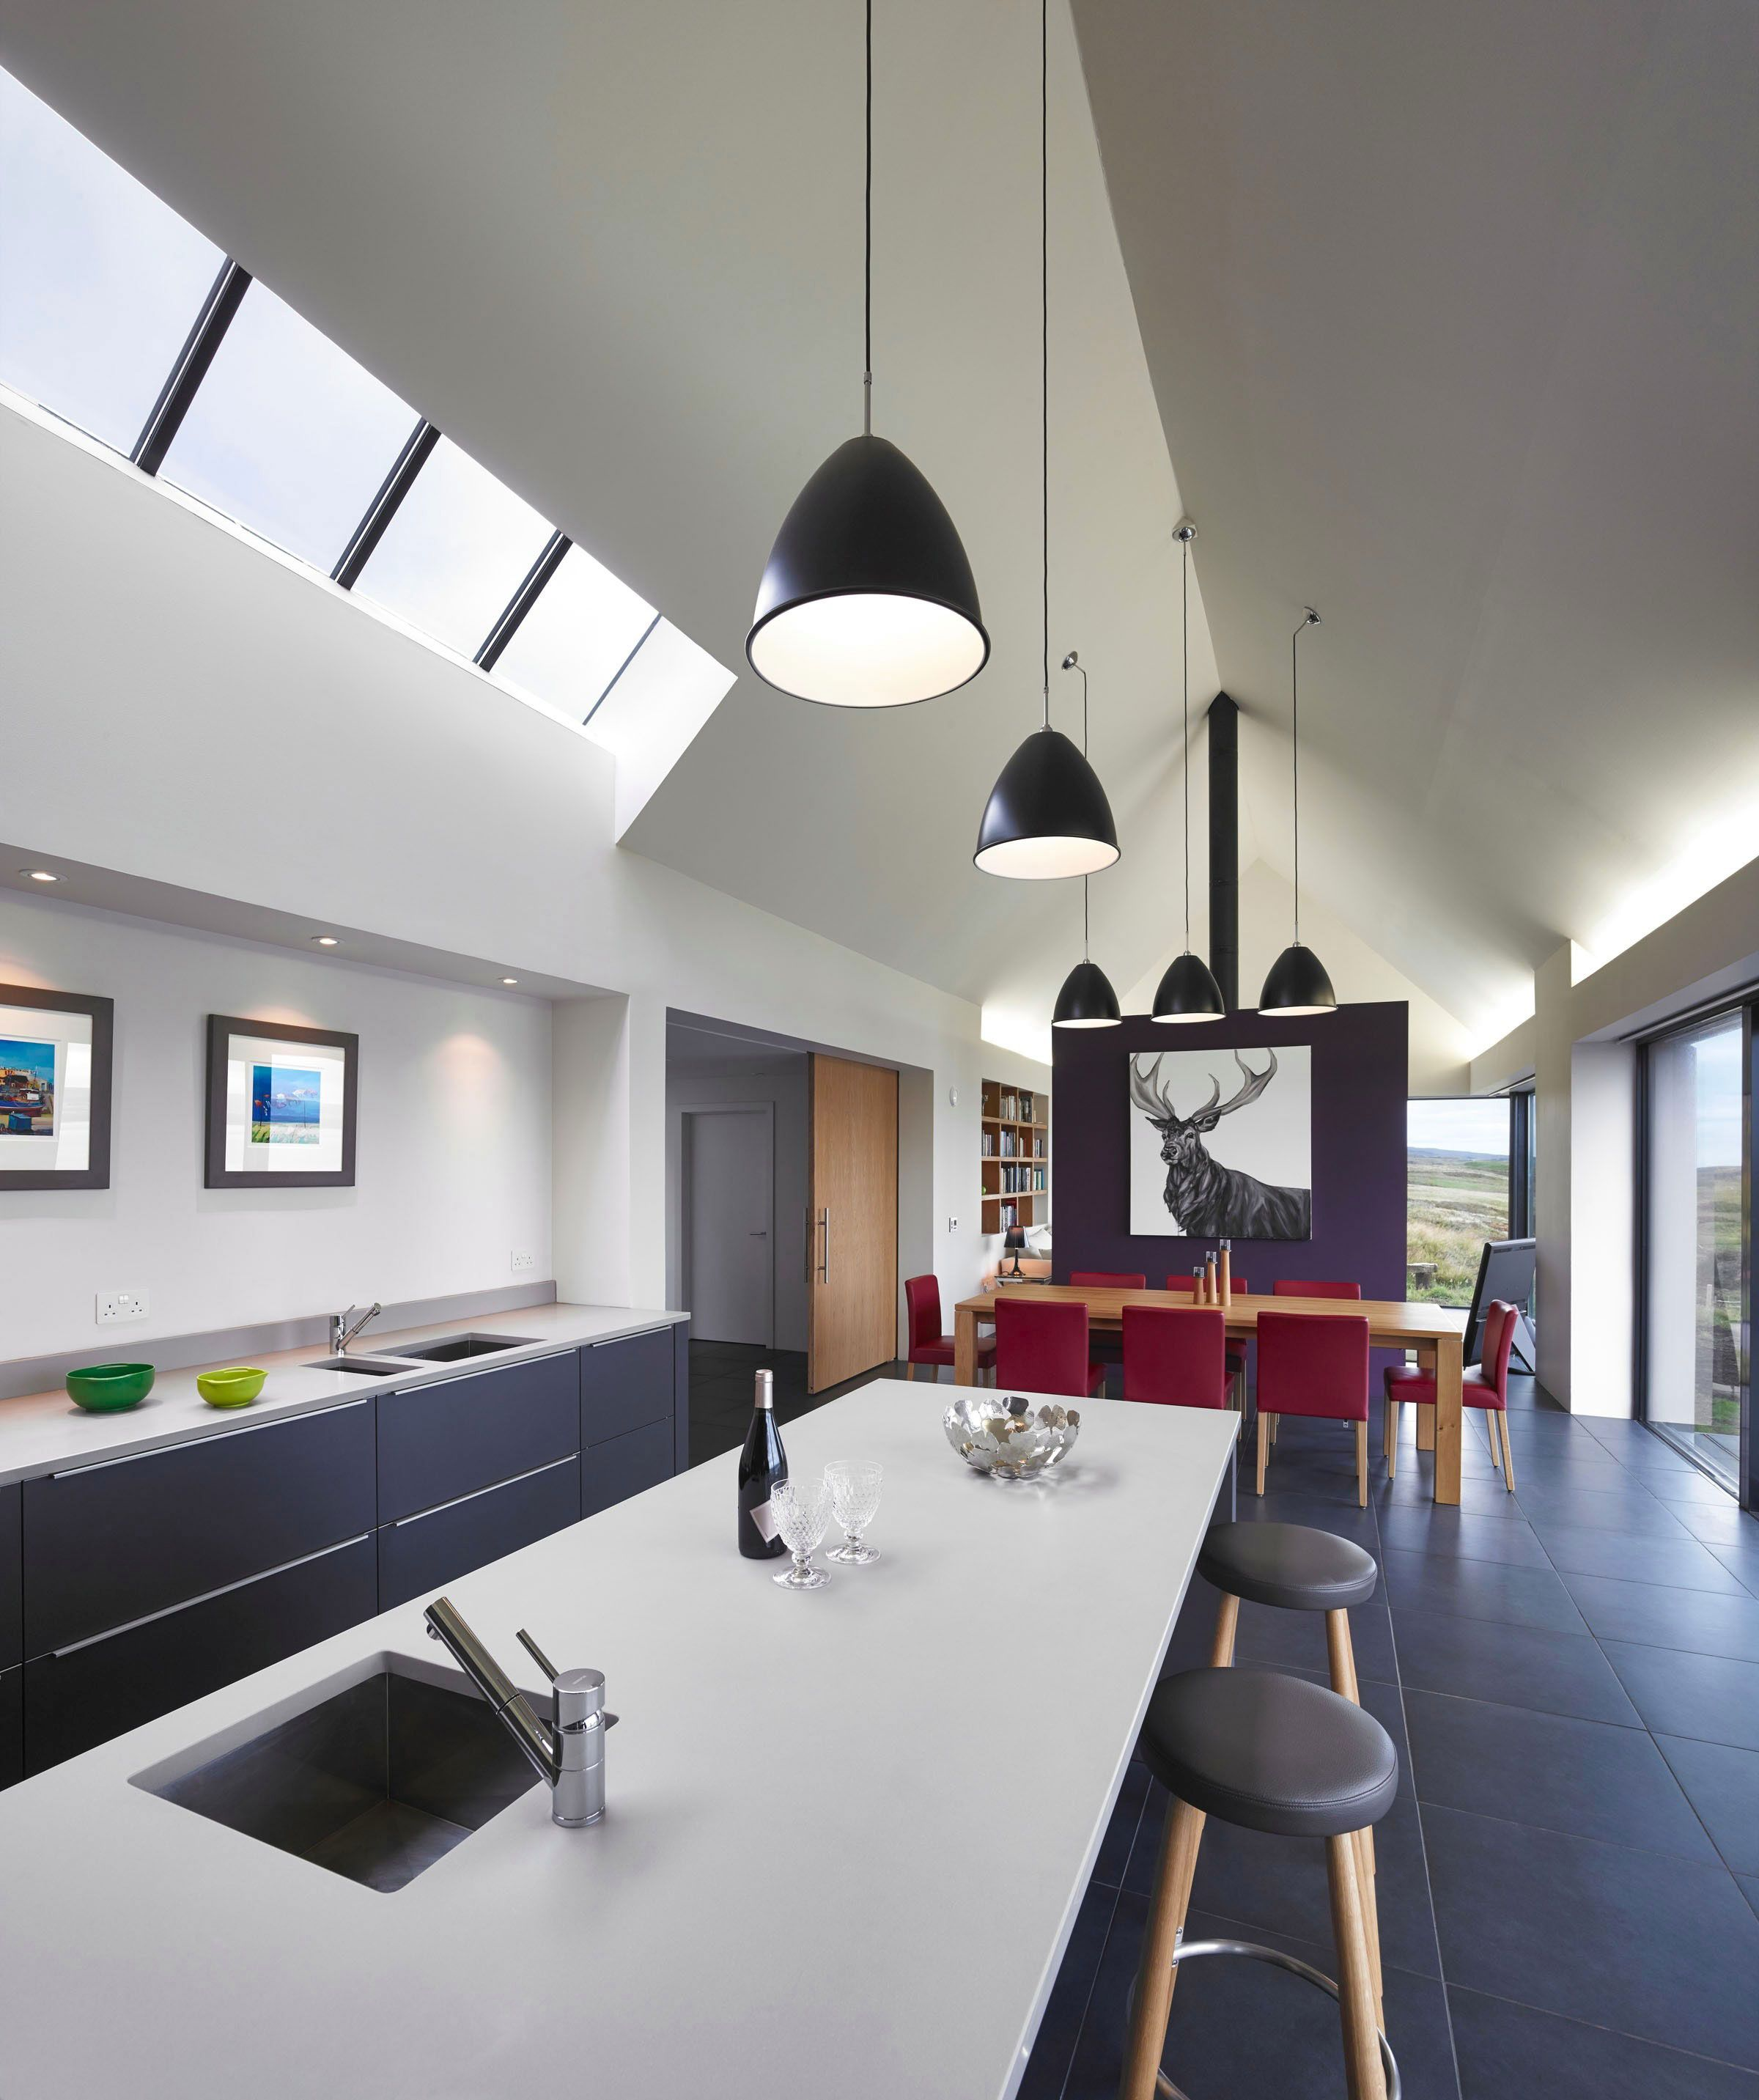 Best Images About Kitchen Remodel On Pinterest Custom - Kitchen design scotland